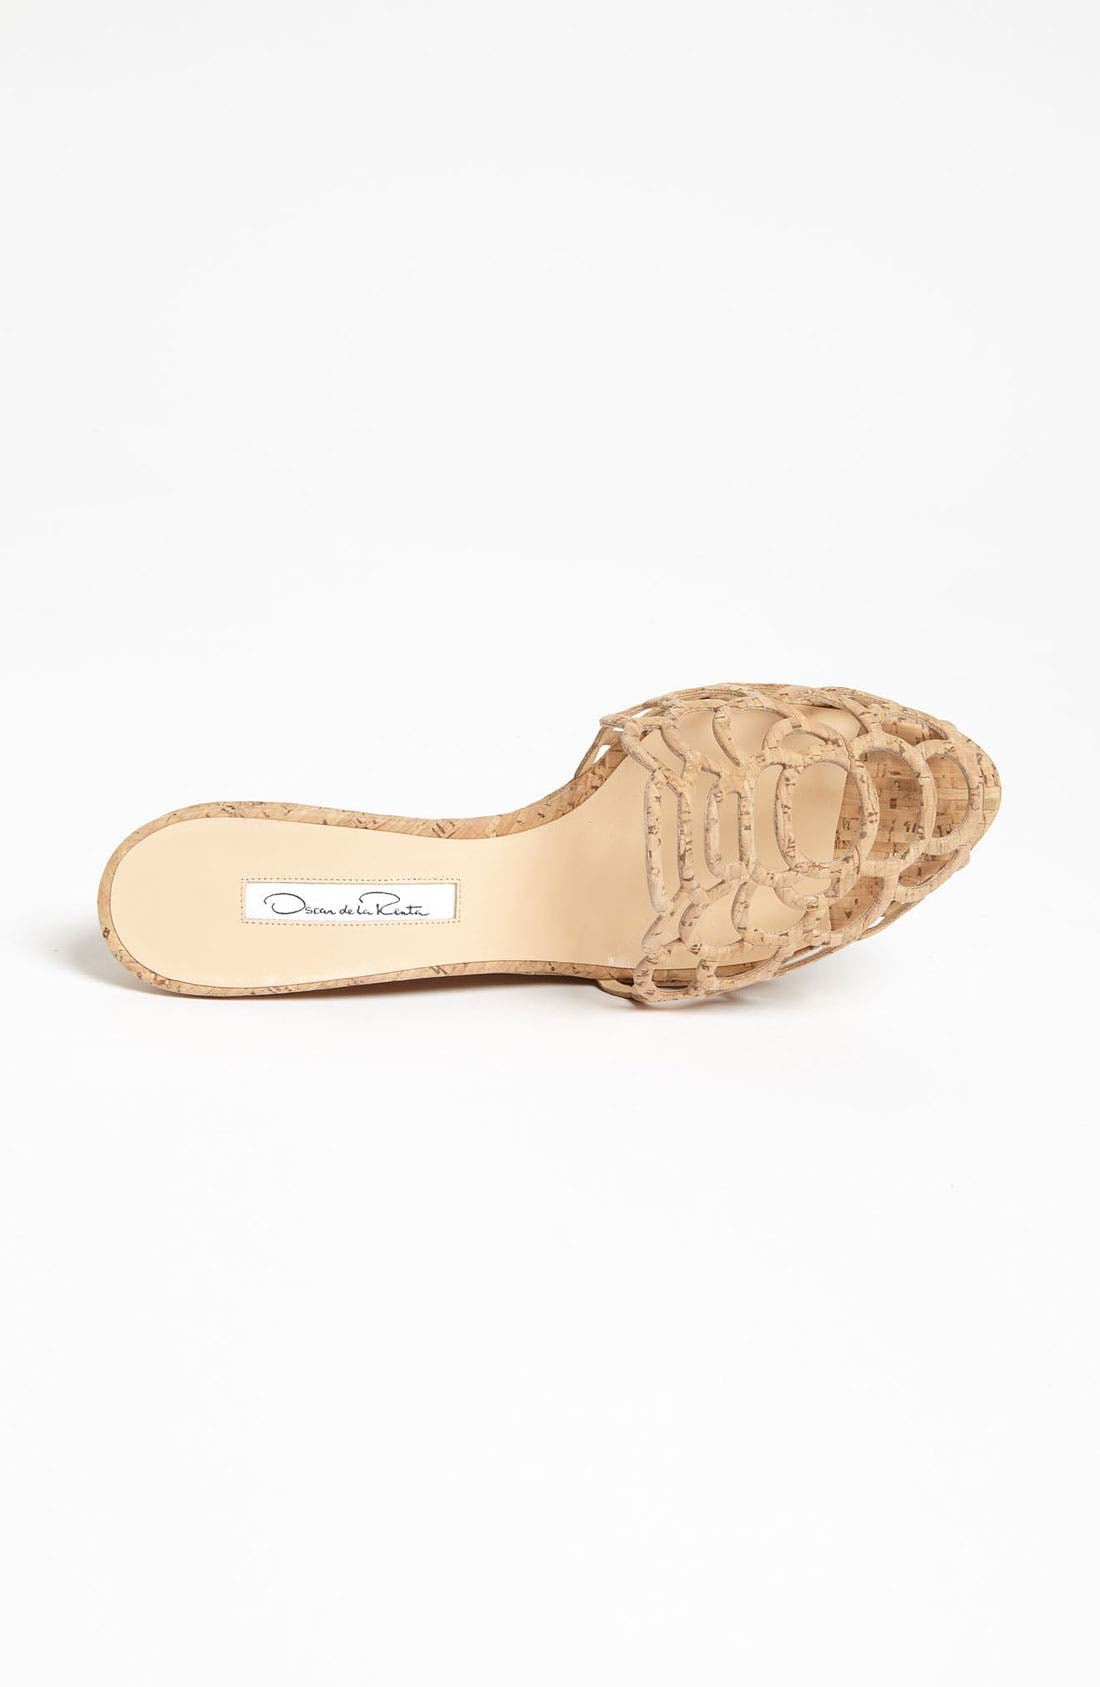 Alternate Image 3  - Oscar de la Renta 'Virma' Cork Sandal